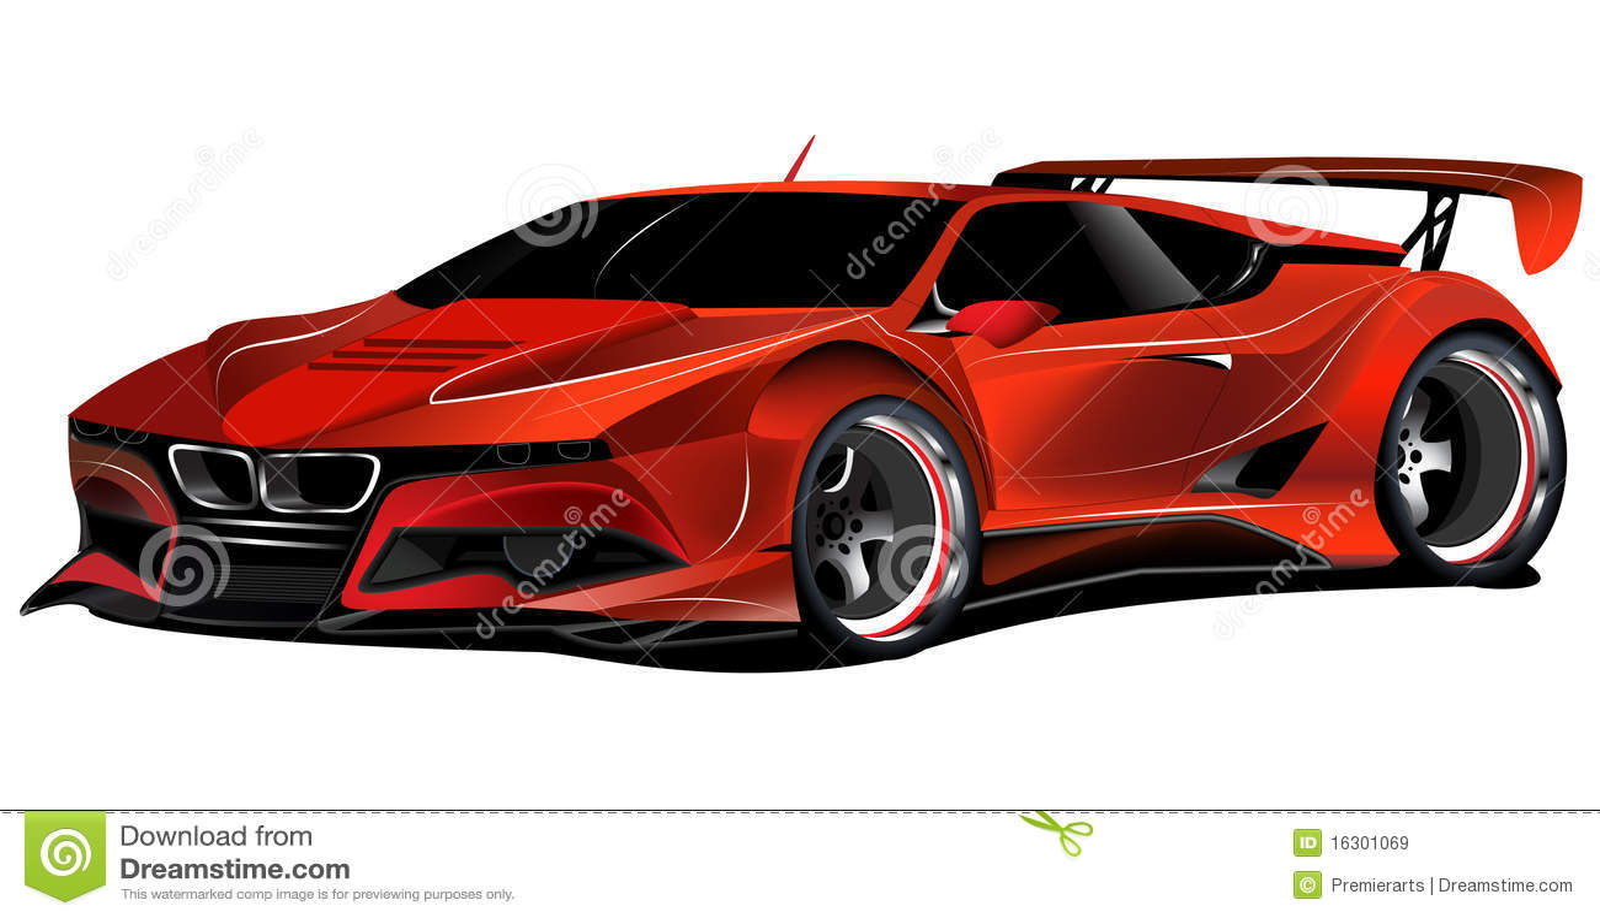 Acura Rally Car Price